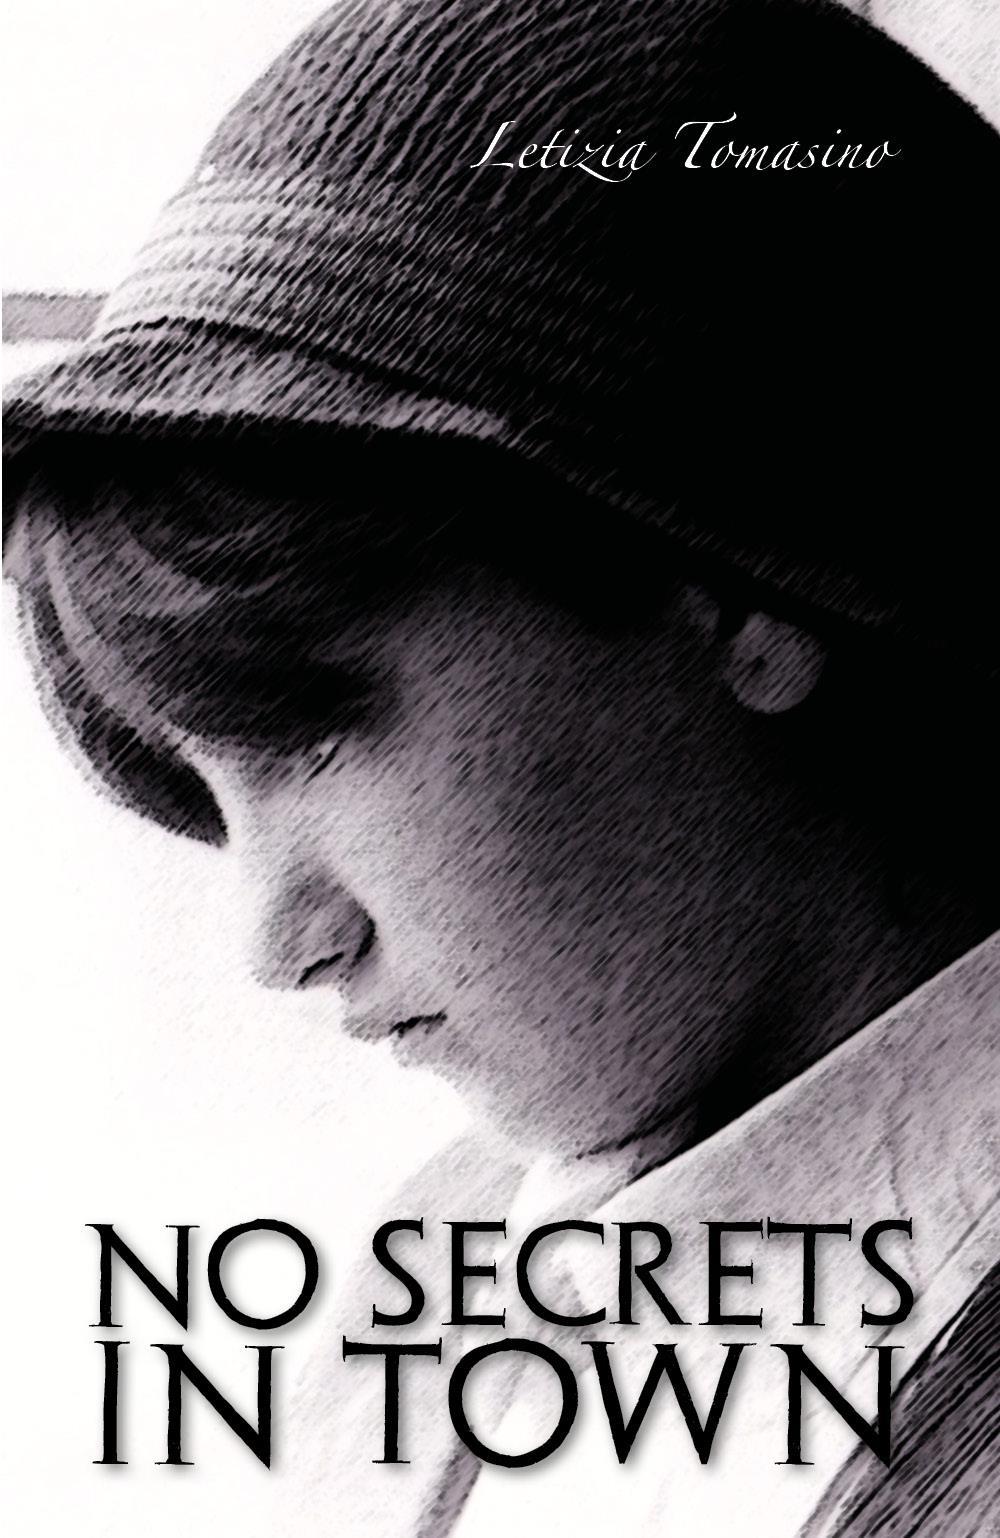 No secrets in town